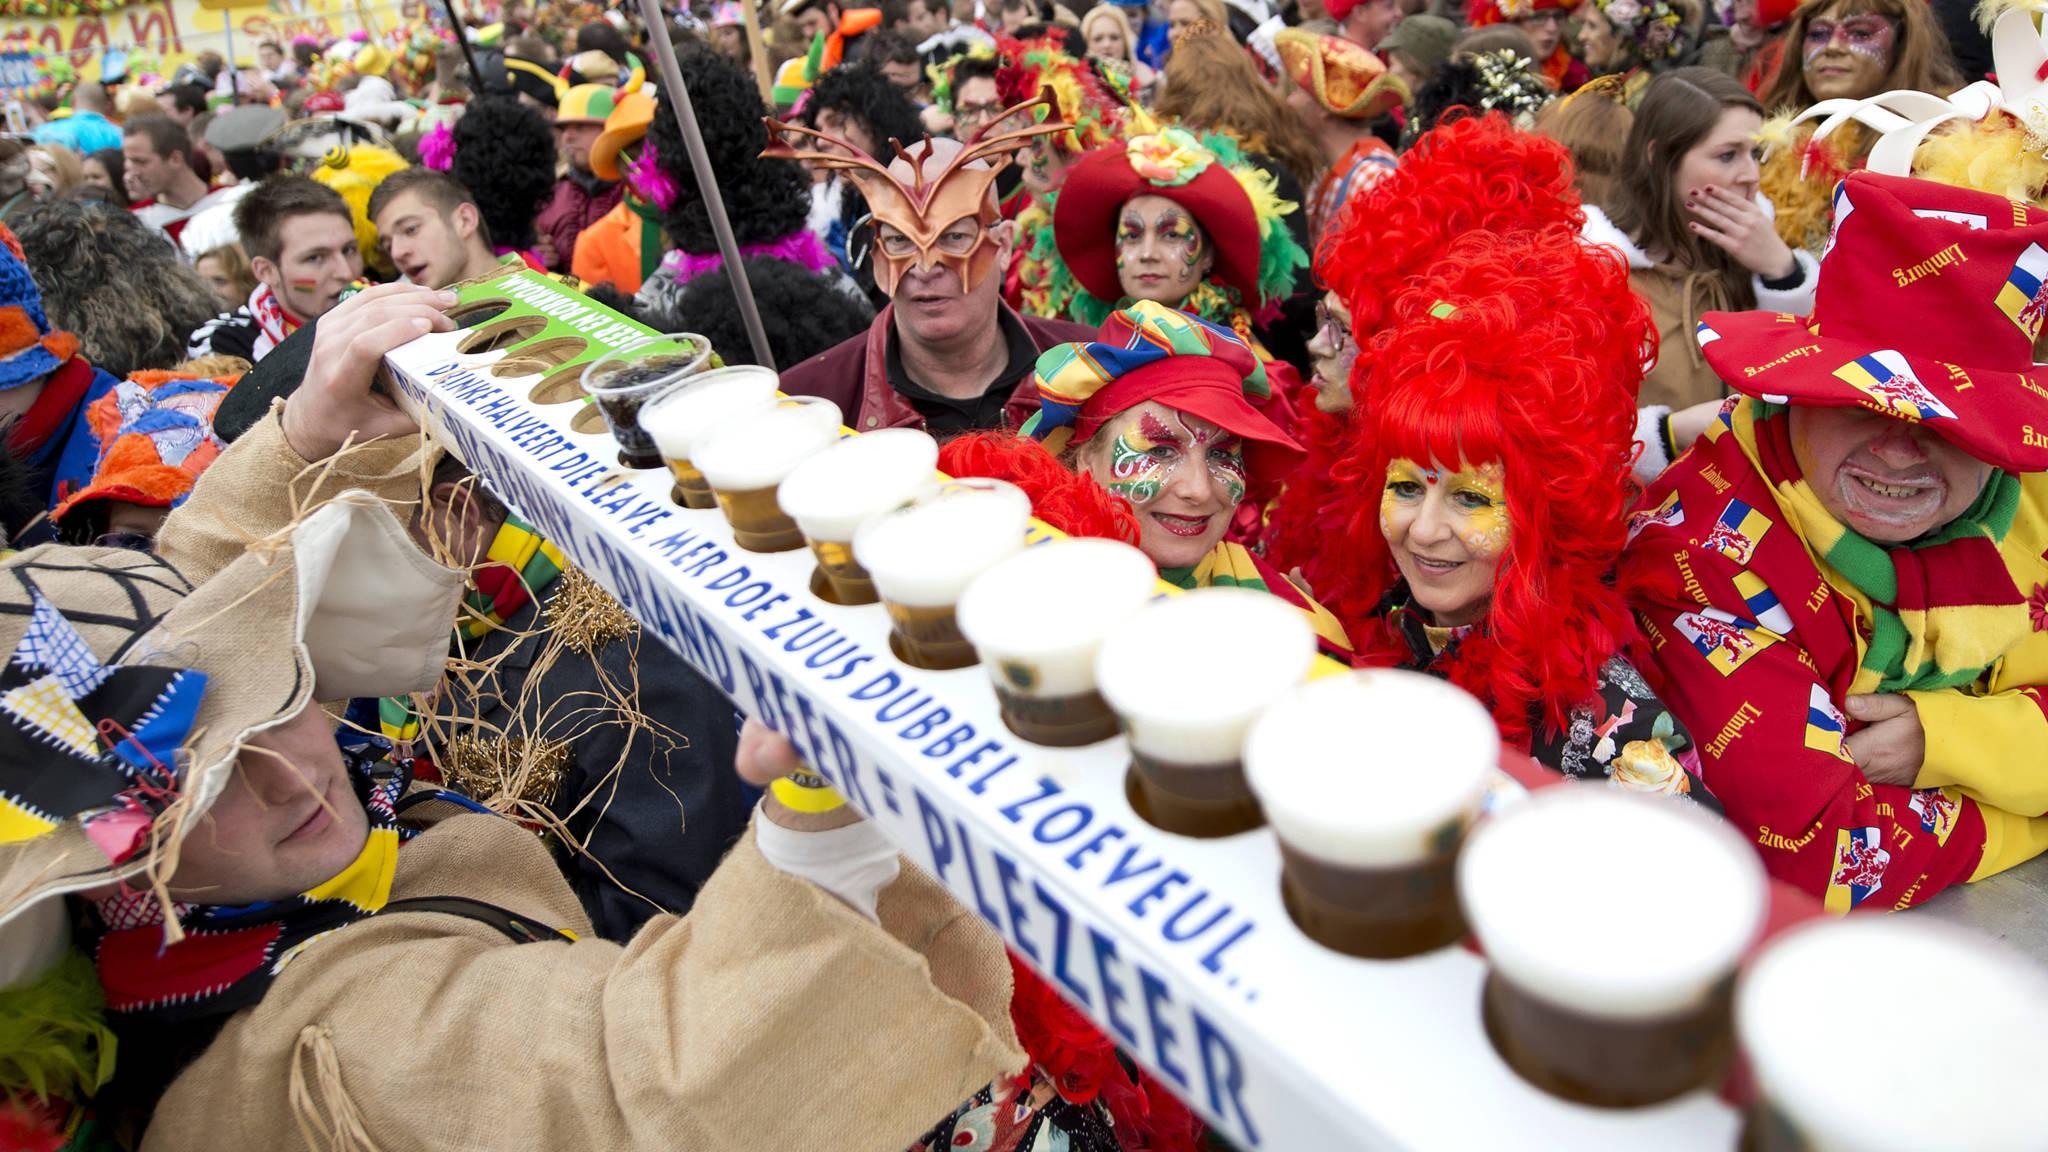 Carnavalskleding kopen? Ontdek het ruime aanbod